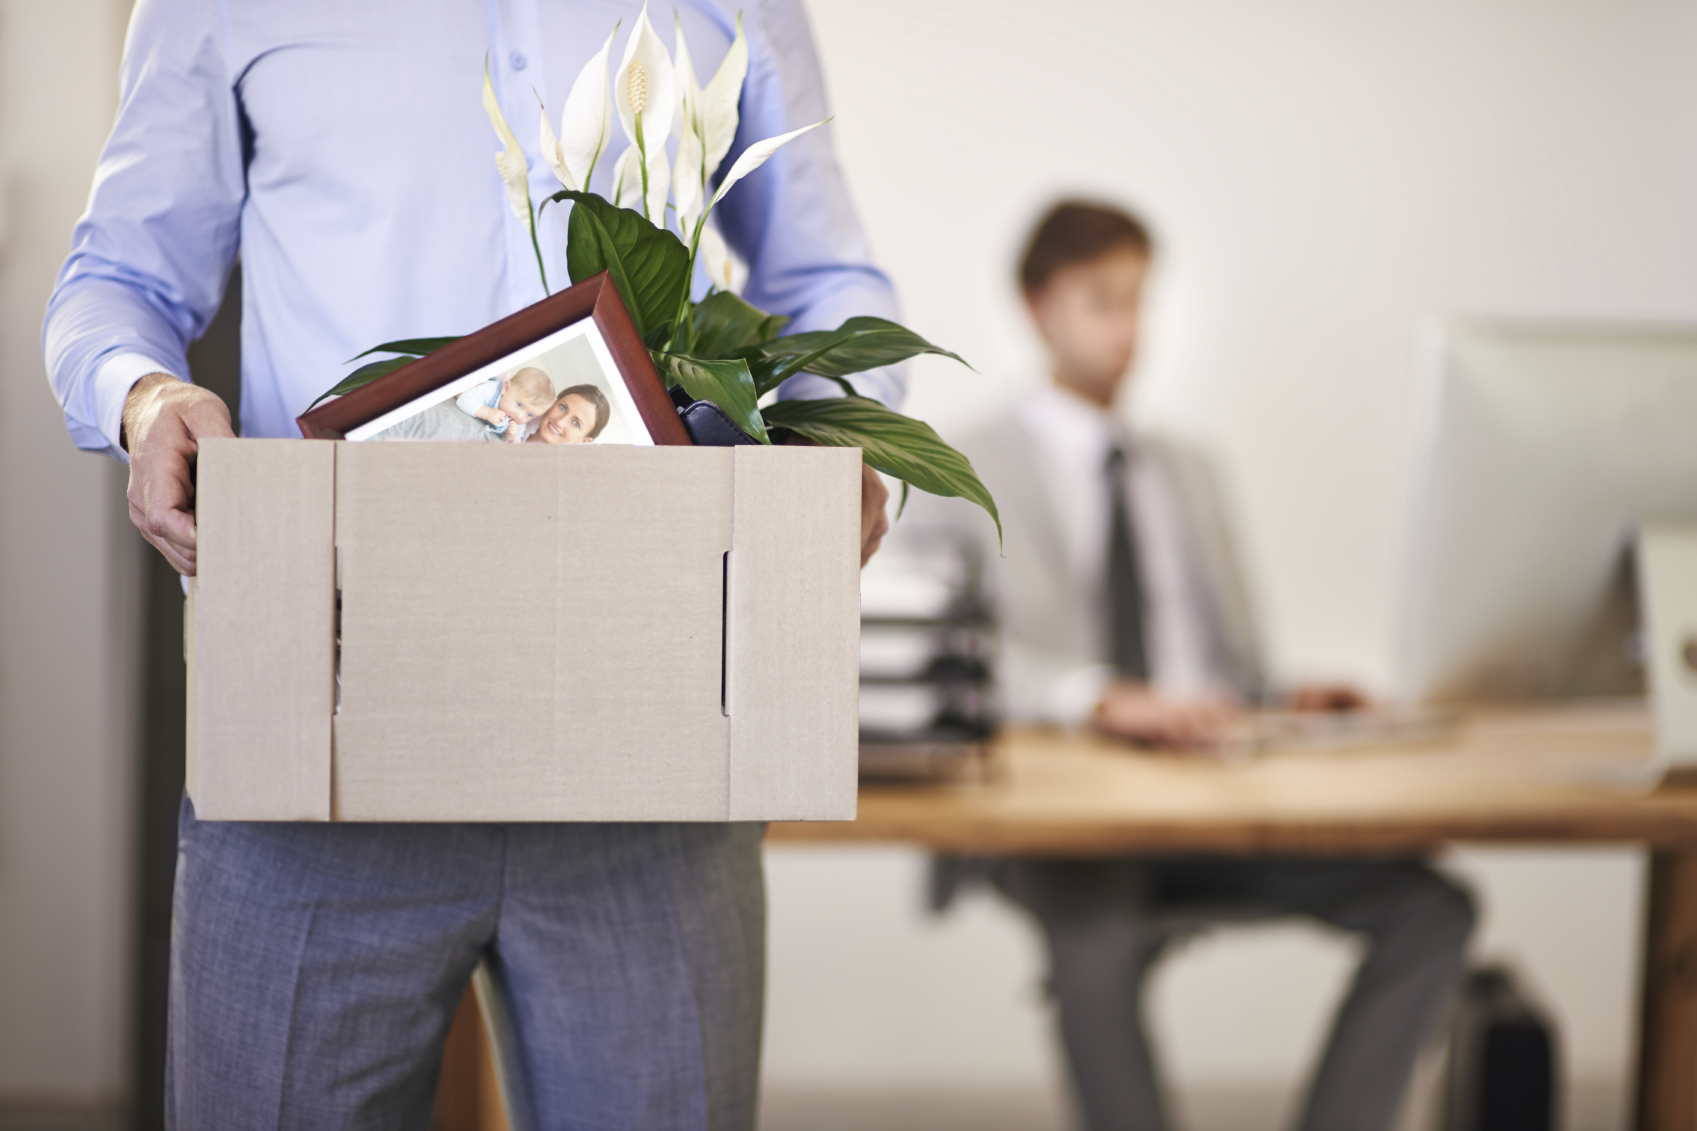 FEATURED IMAGE 5 ways to reduce employee churn - 5 Ways to Minimize Employee Churn and Keep Staff Happy